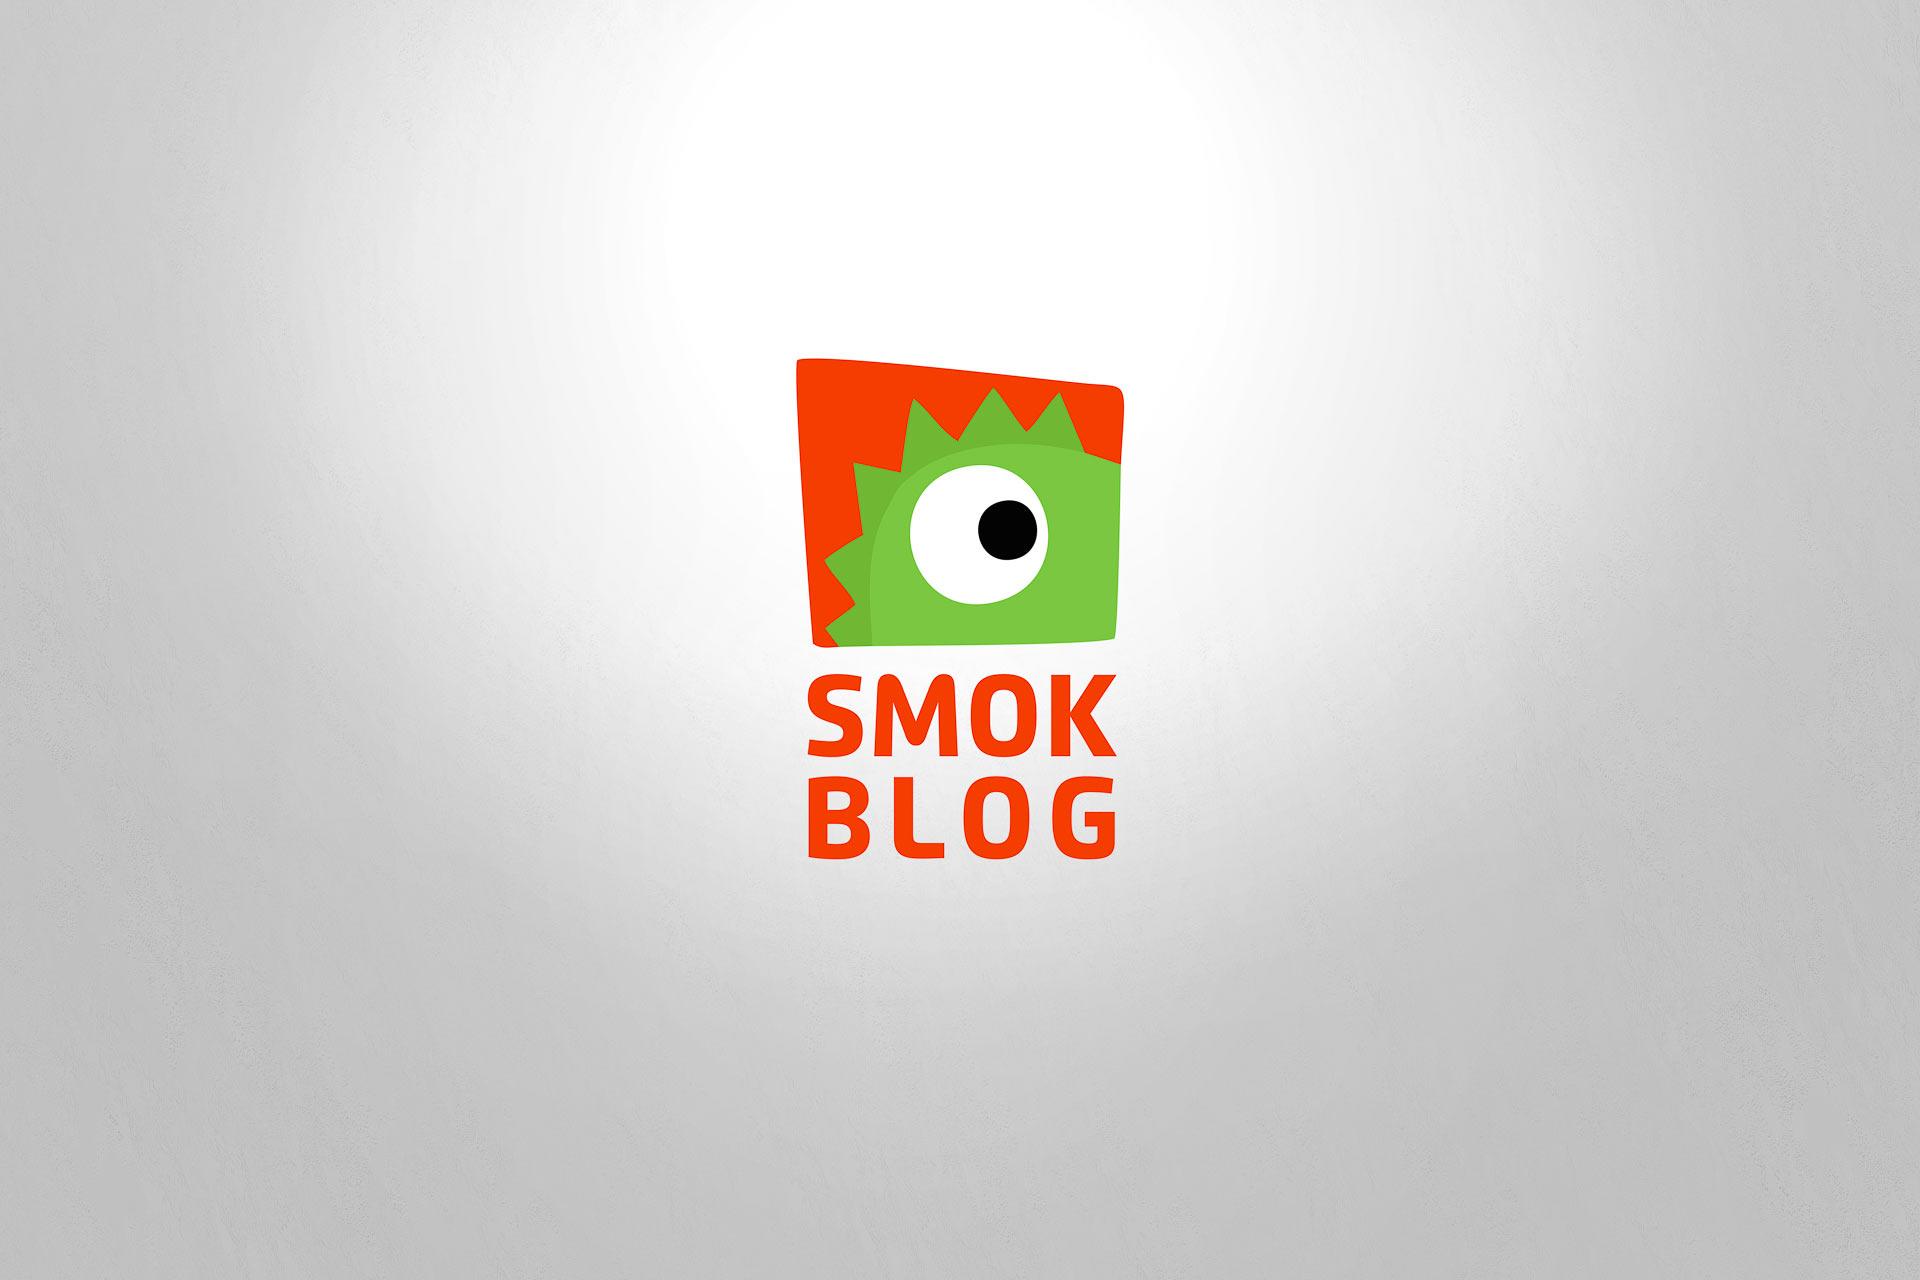 Smok Blog logo